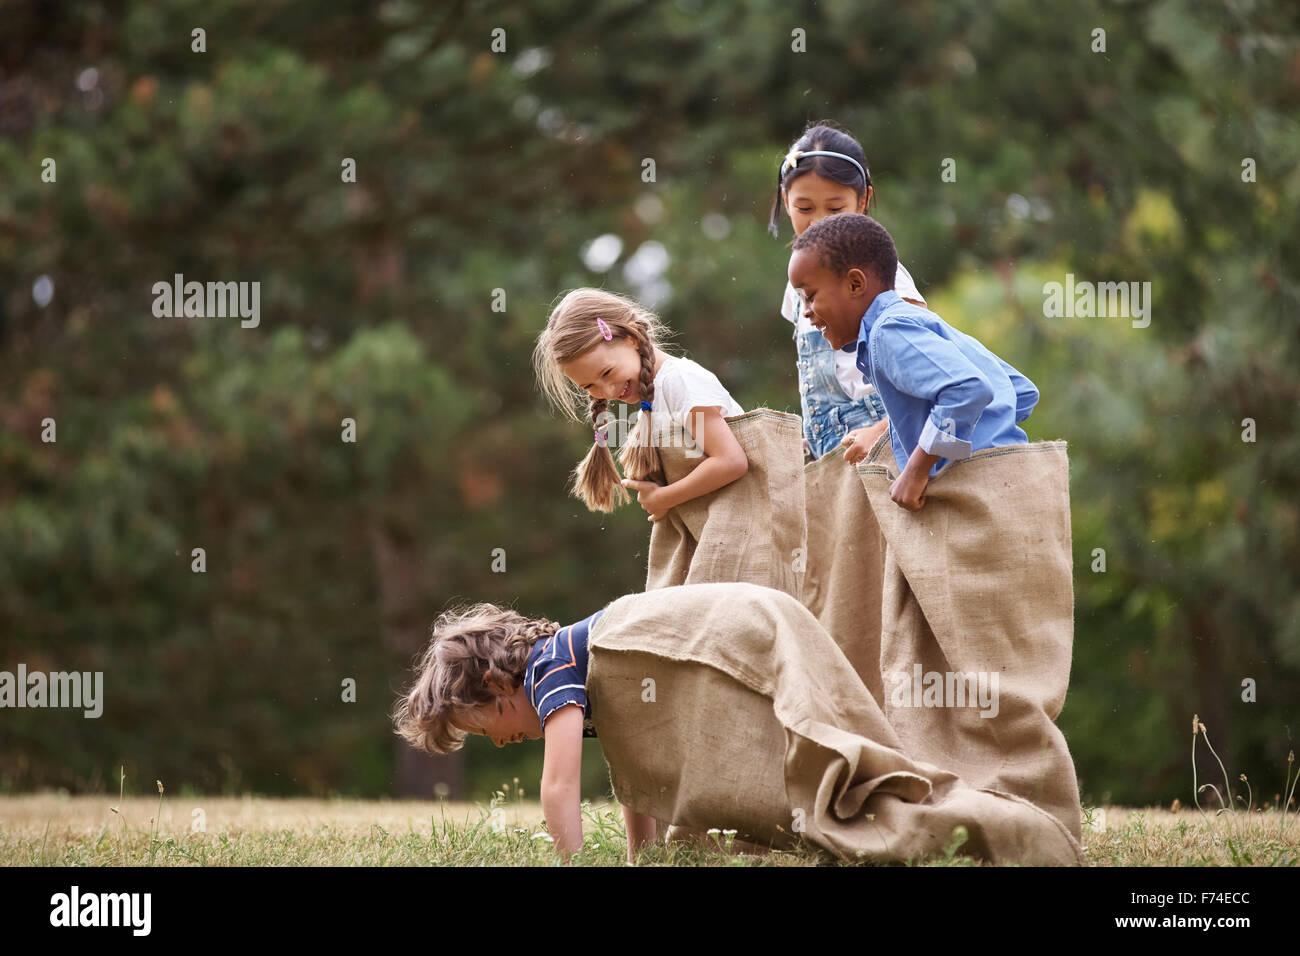 Gruppo di interracial kids concorrenti a sacco gara Immagini Stock